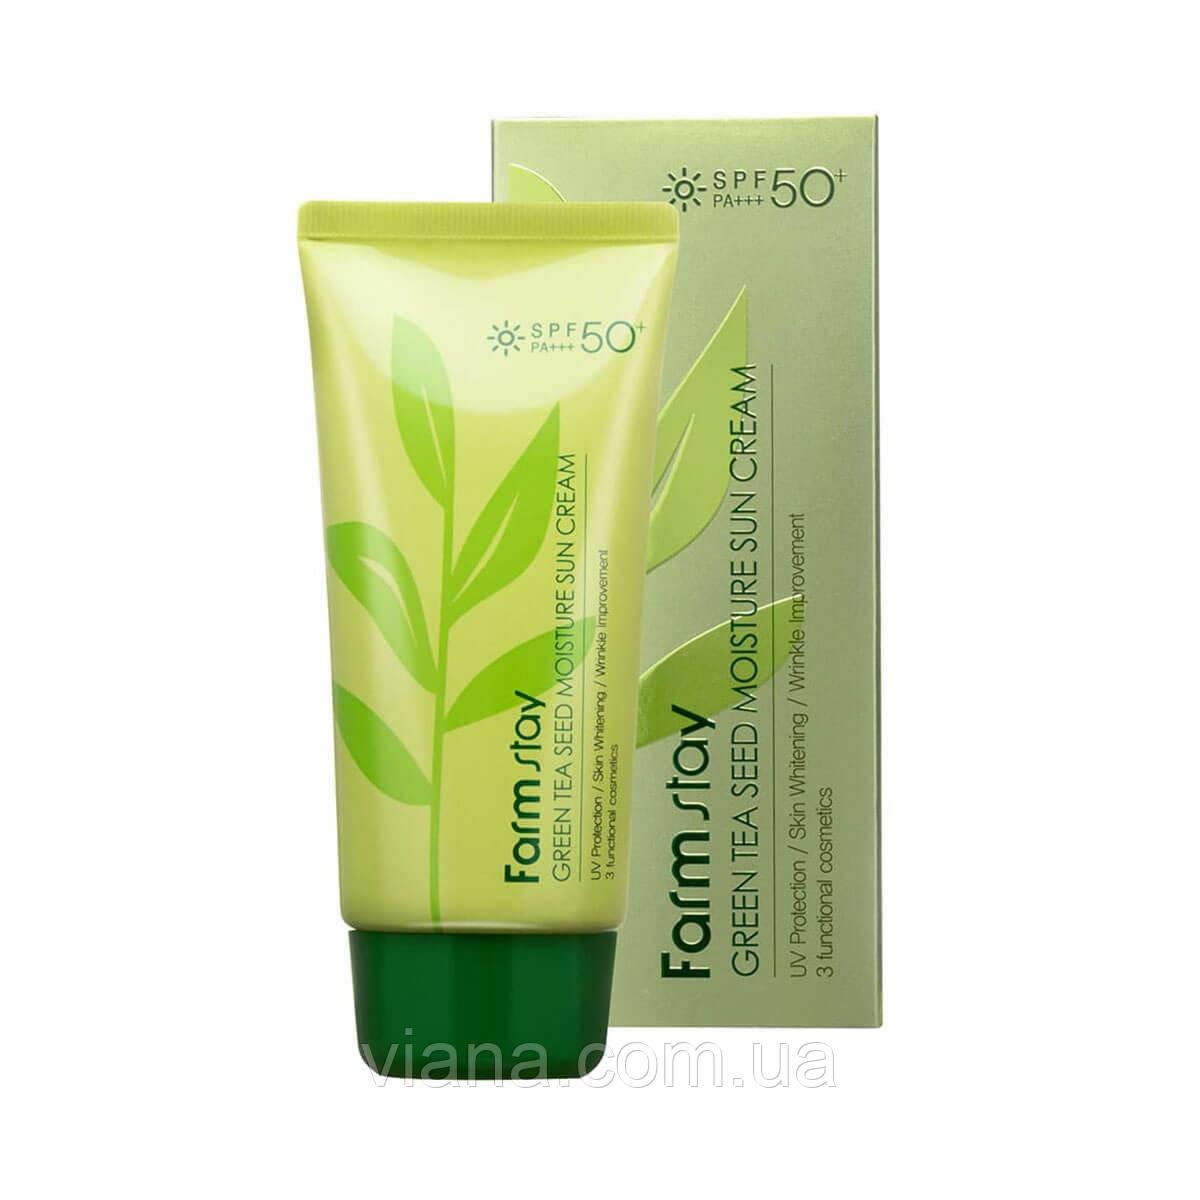 Увлажняющий солнцезащитный крем с семенами зеленого чая FARMSTAY Green Tea Seed Moisture Sun Cream SPF50 70 ml